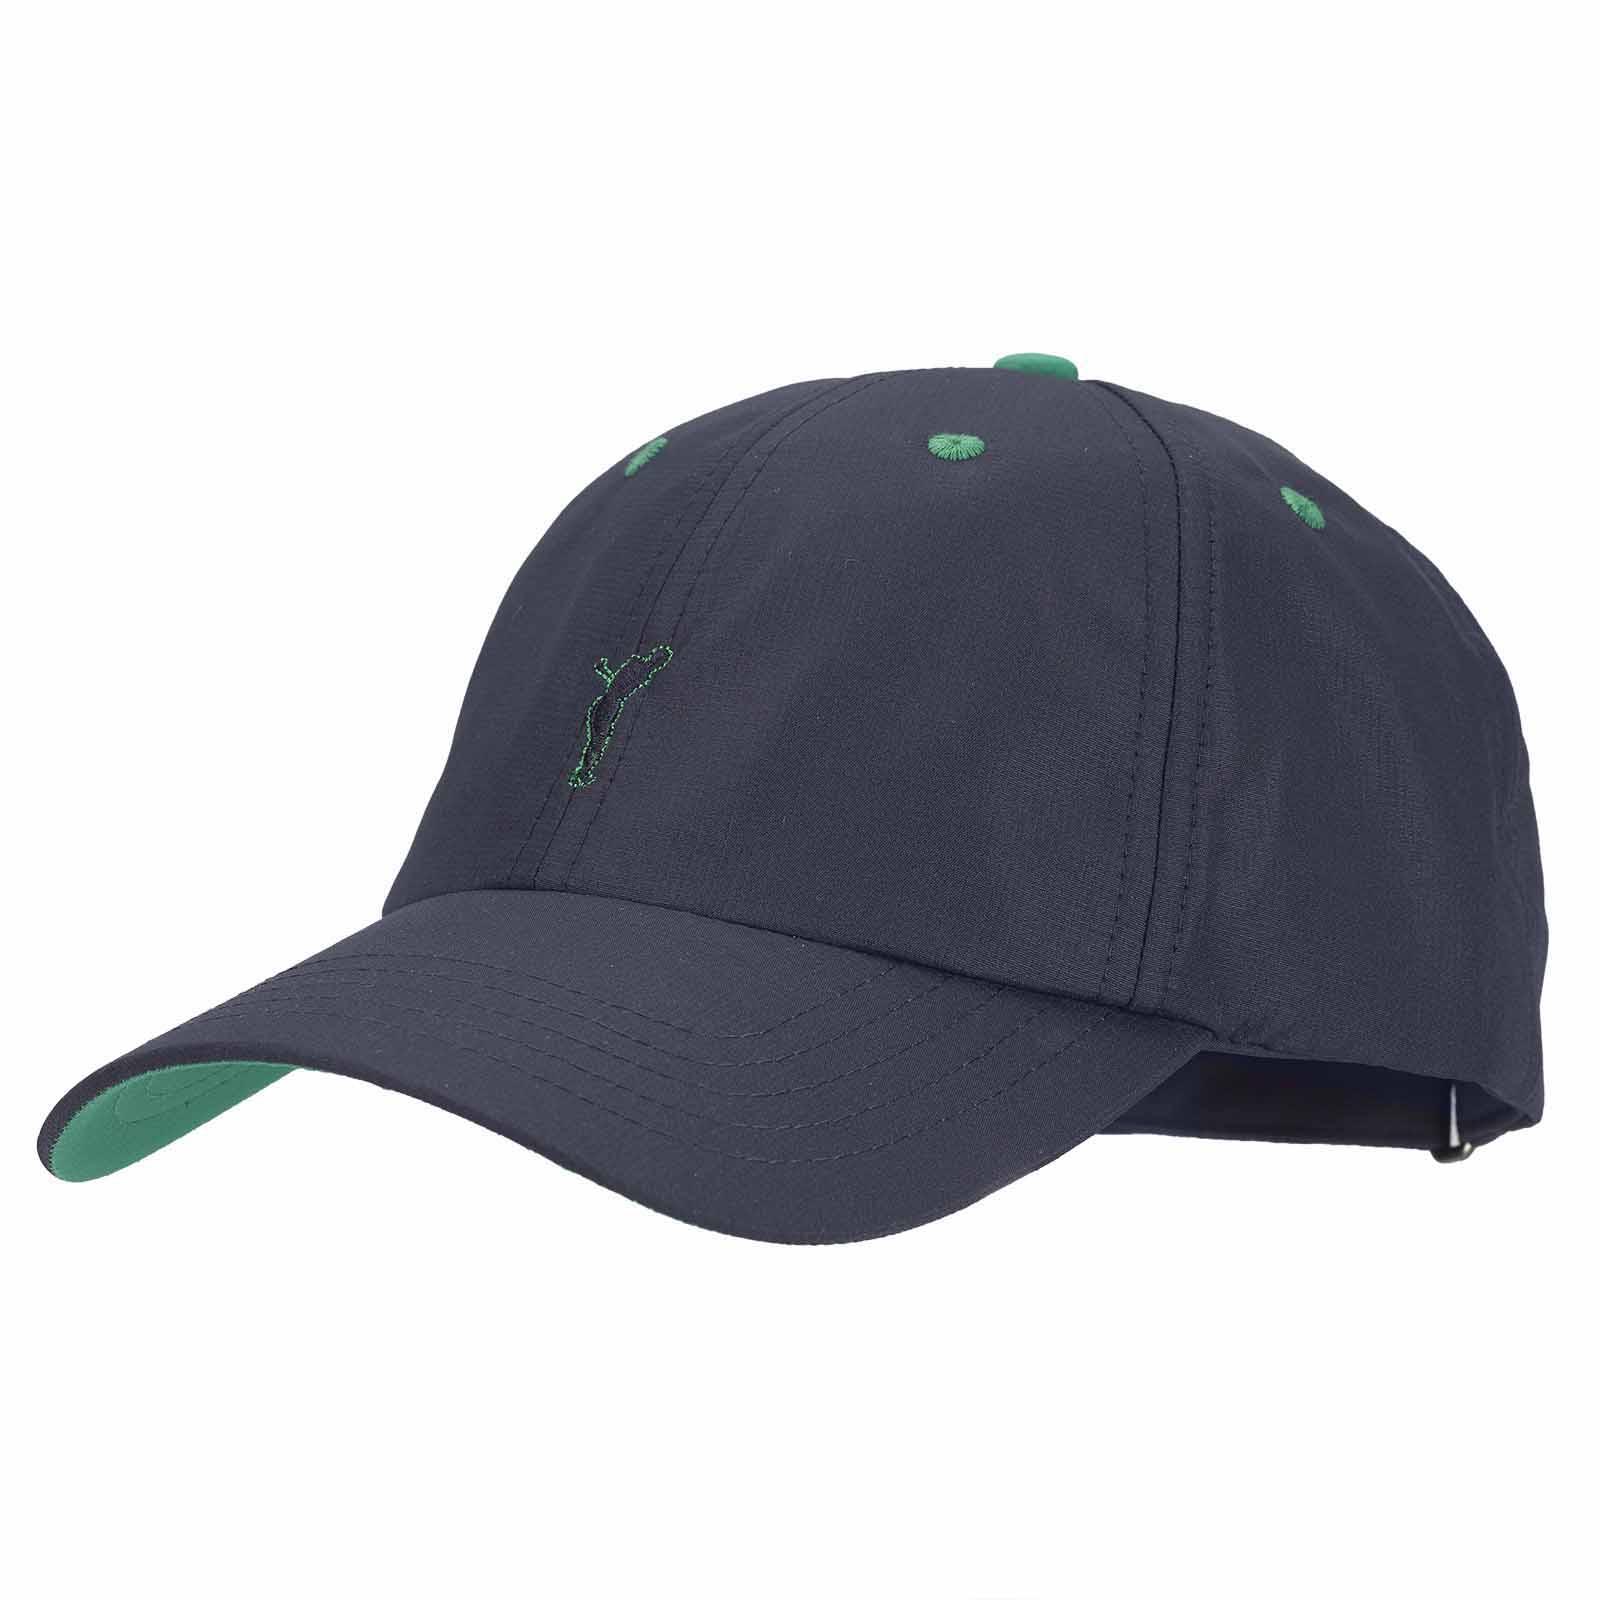 Herren Golfcap aus atmungsaktiver Microfaser